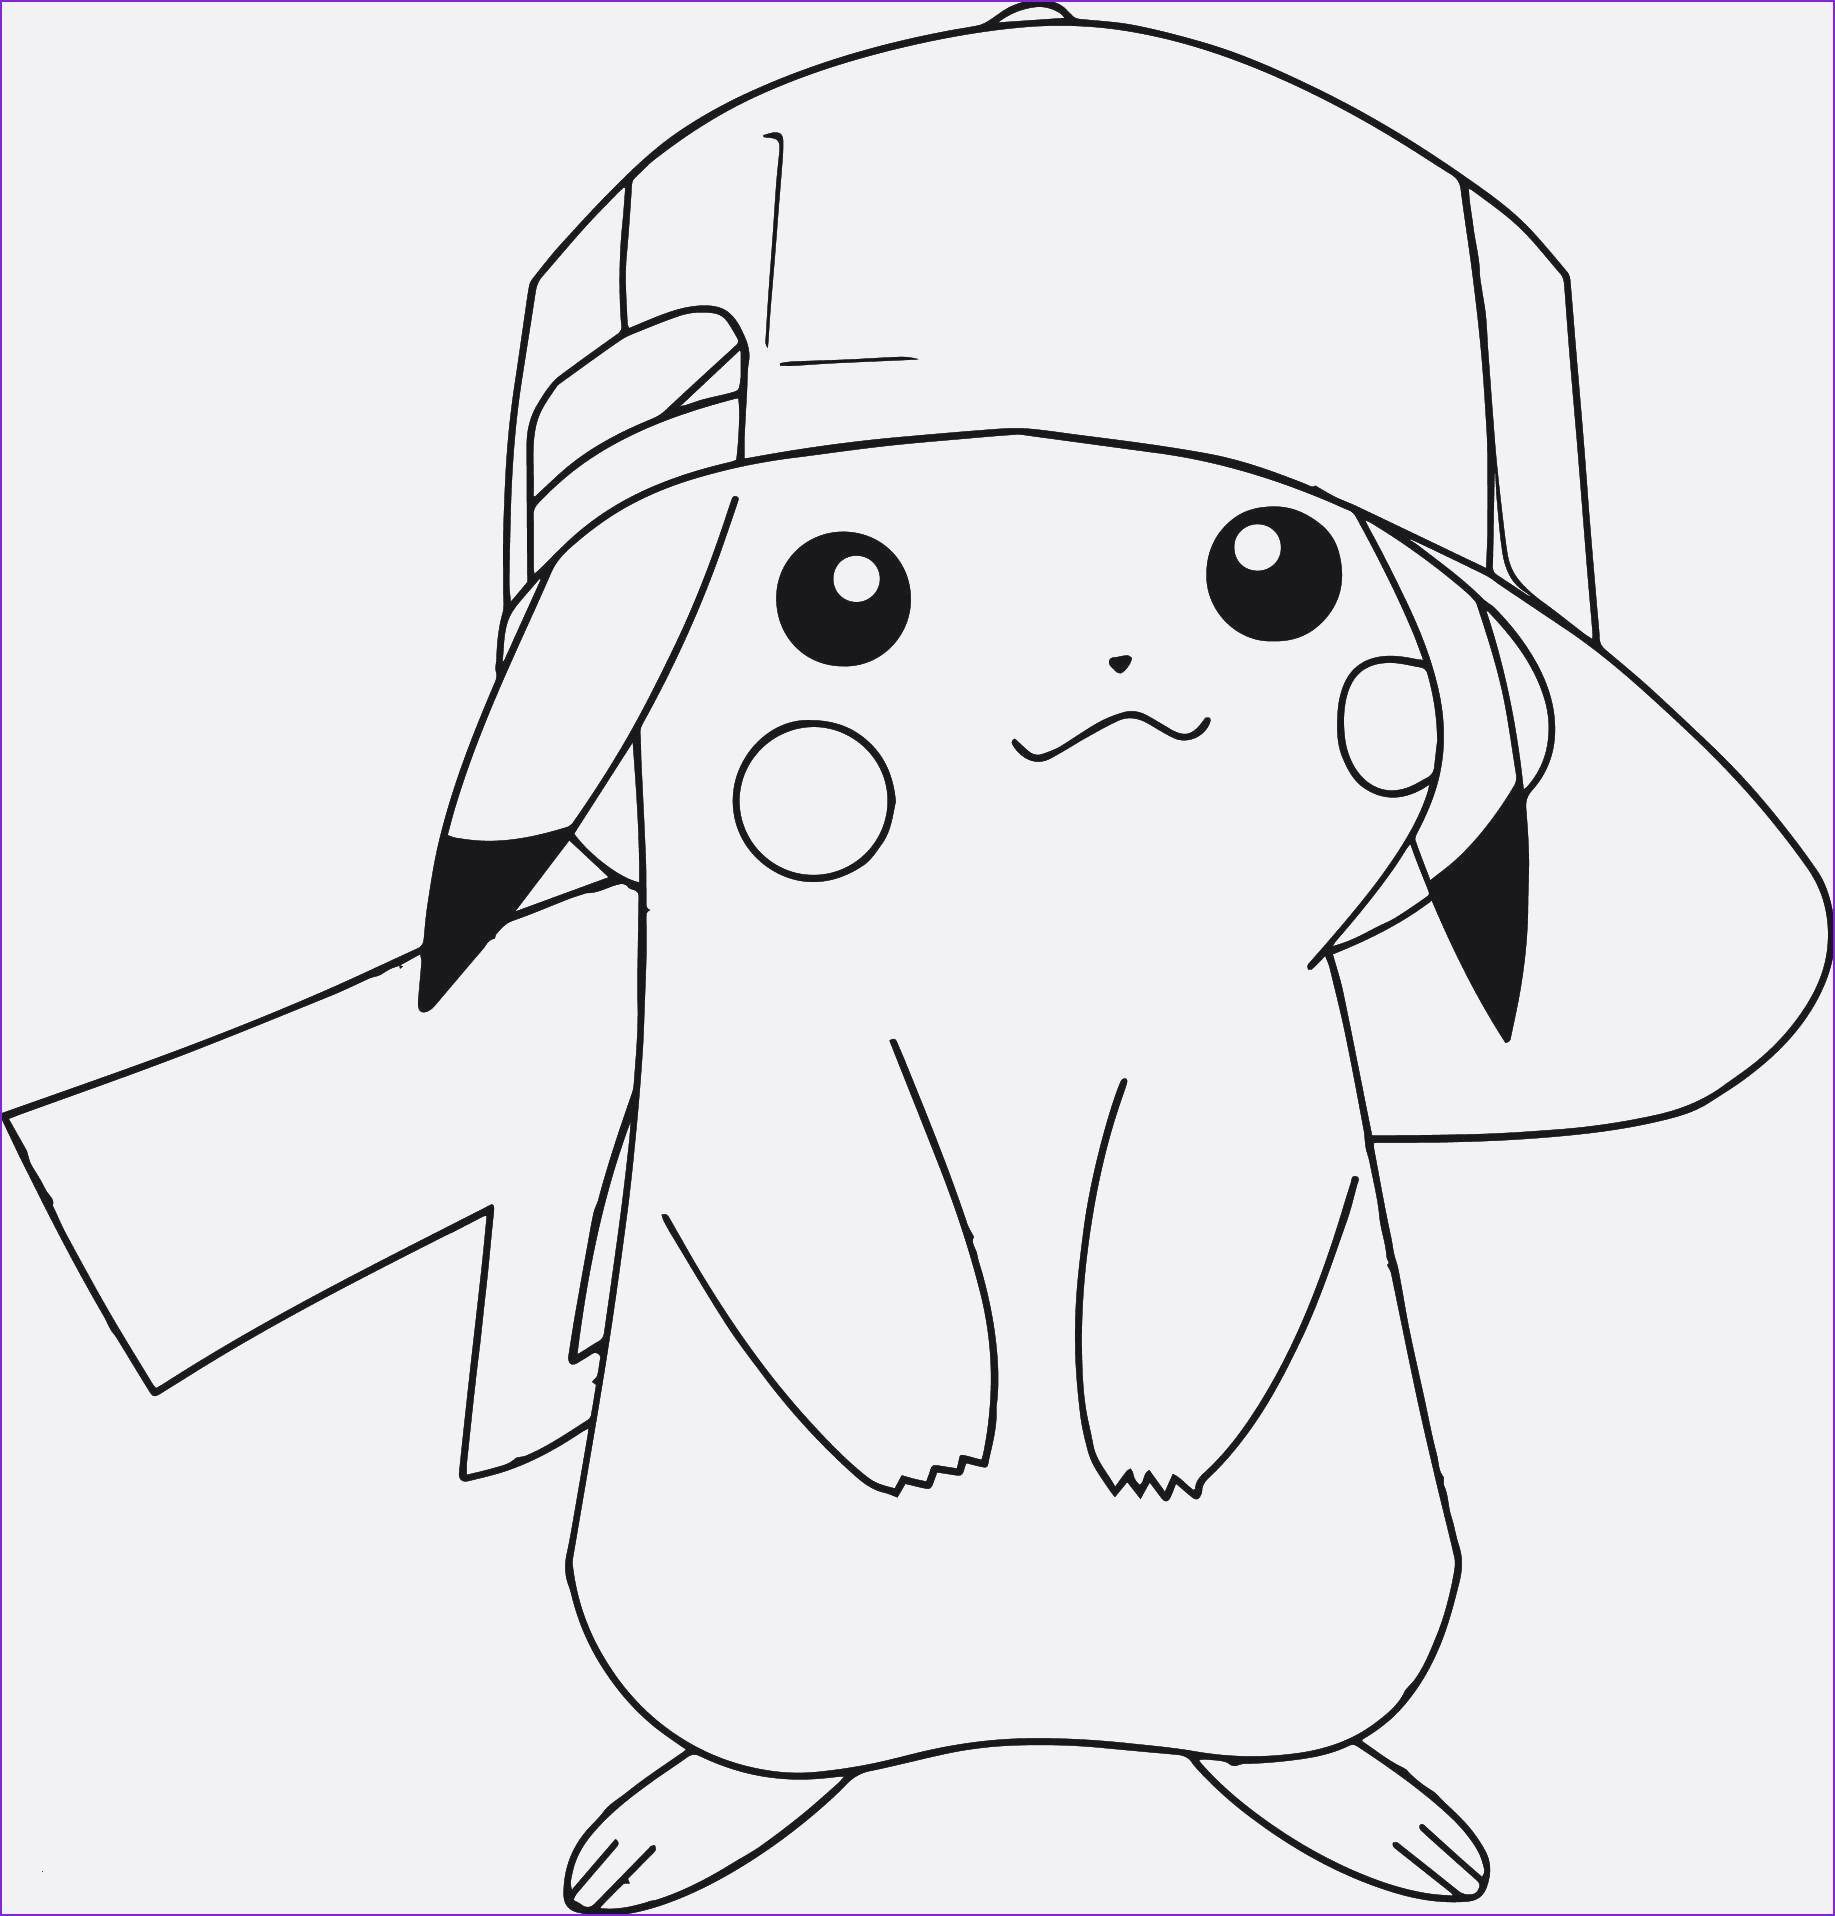 Ausmalbilder Pokemon 1ausmalbilder Com Coloringpagestoprint